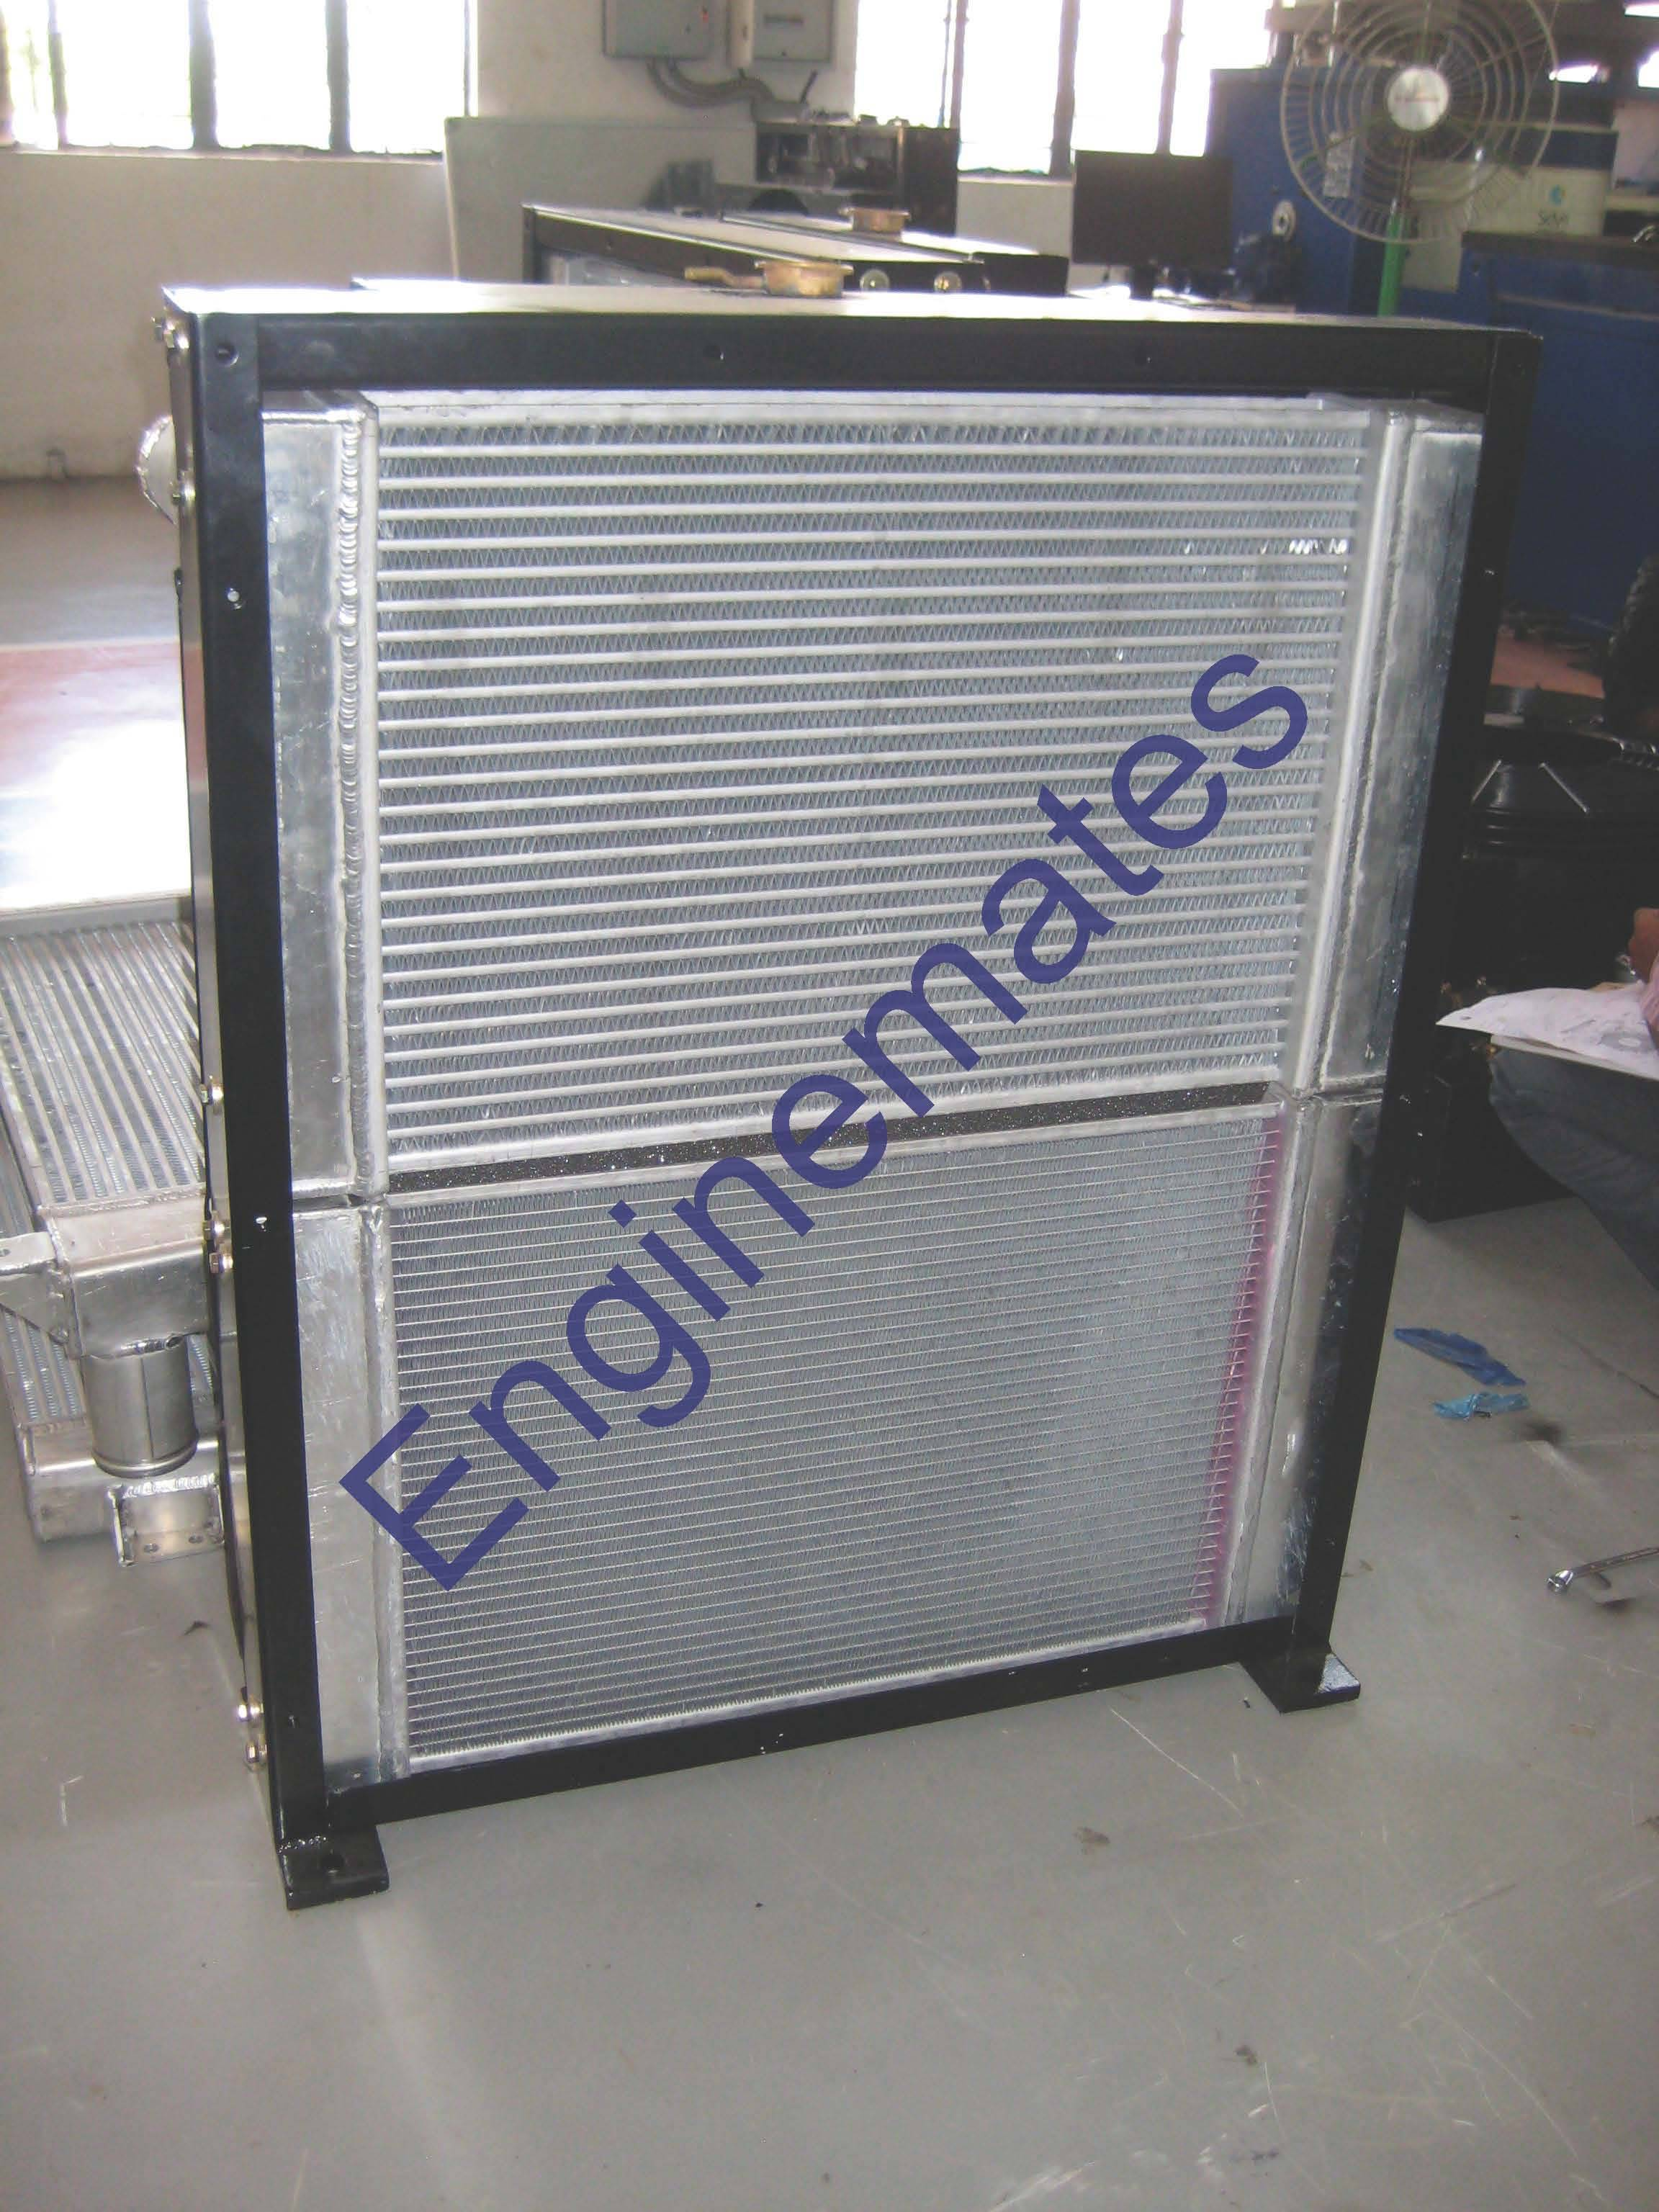 Radiator cum Oil Cooler for construction equipments.